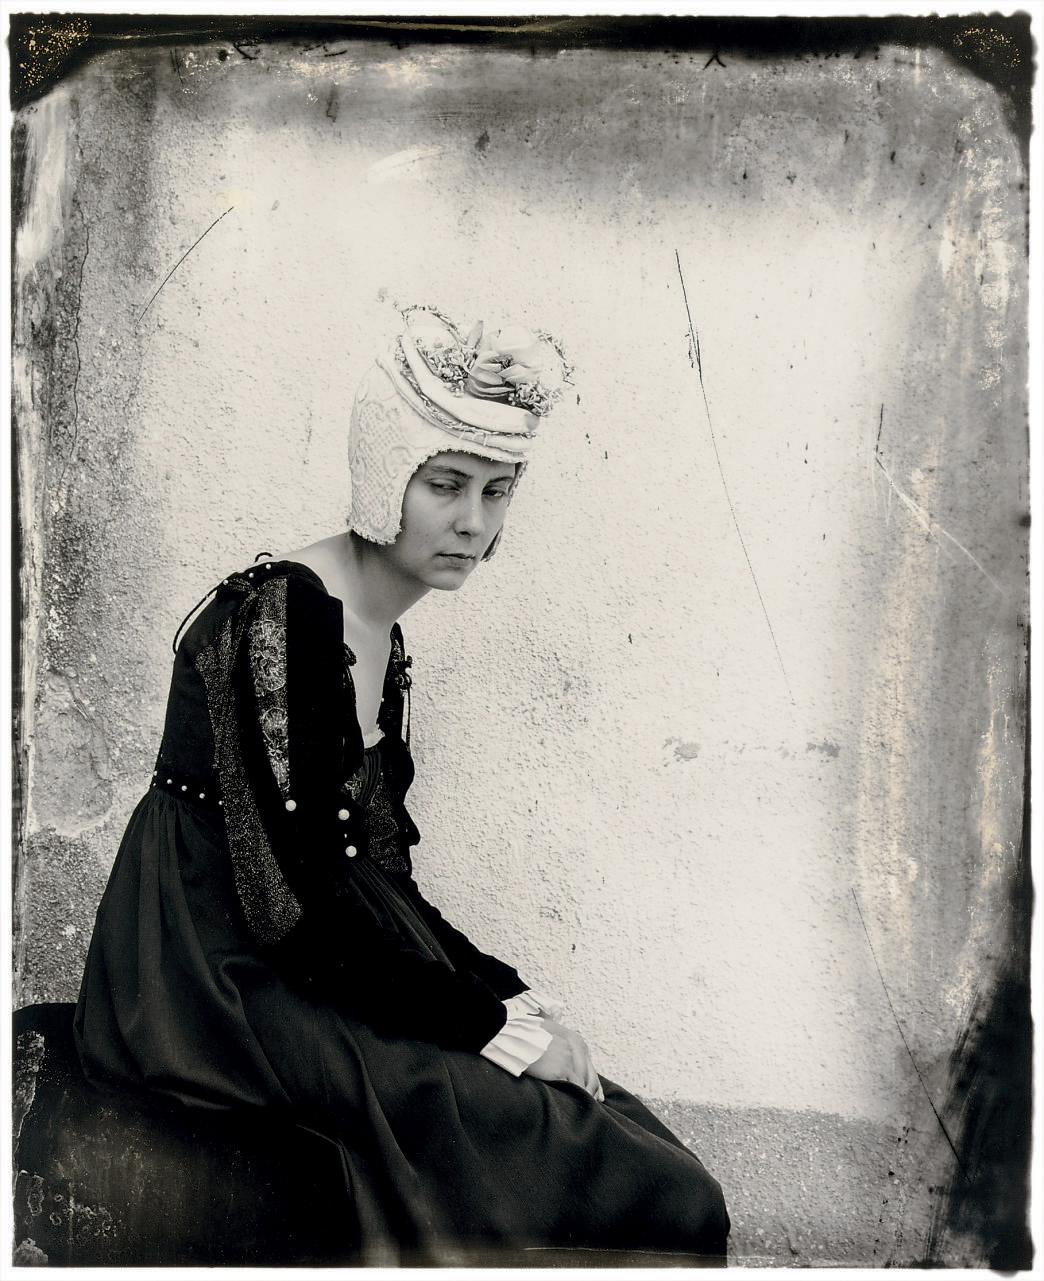 Costumed Inmate, Insane Asylum, Budapest, 1993